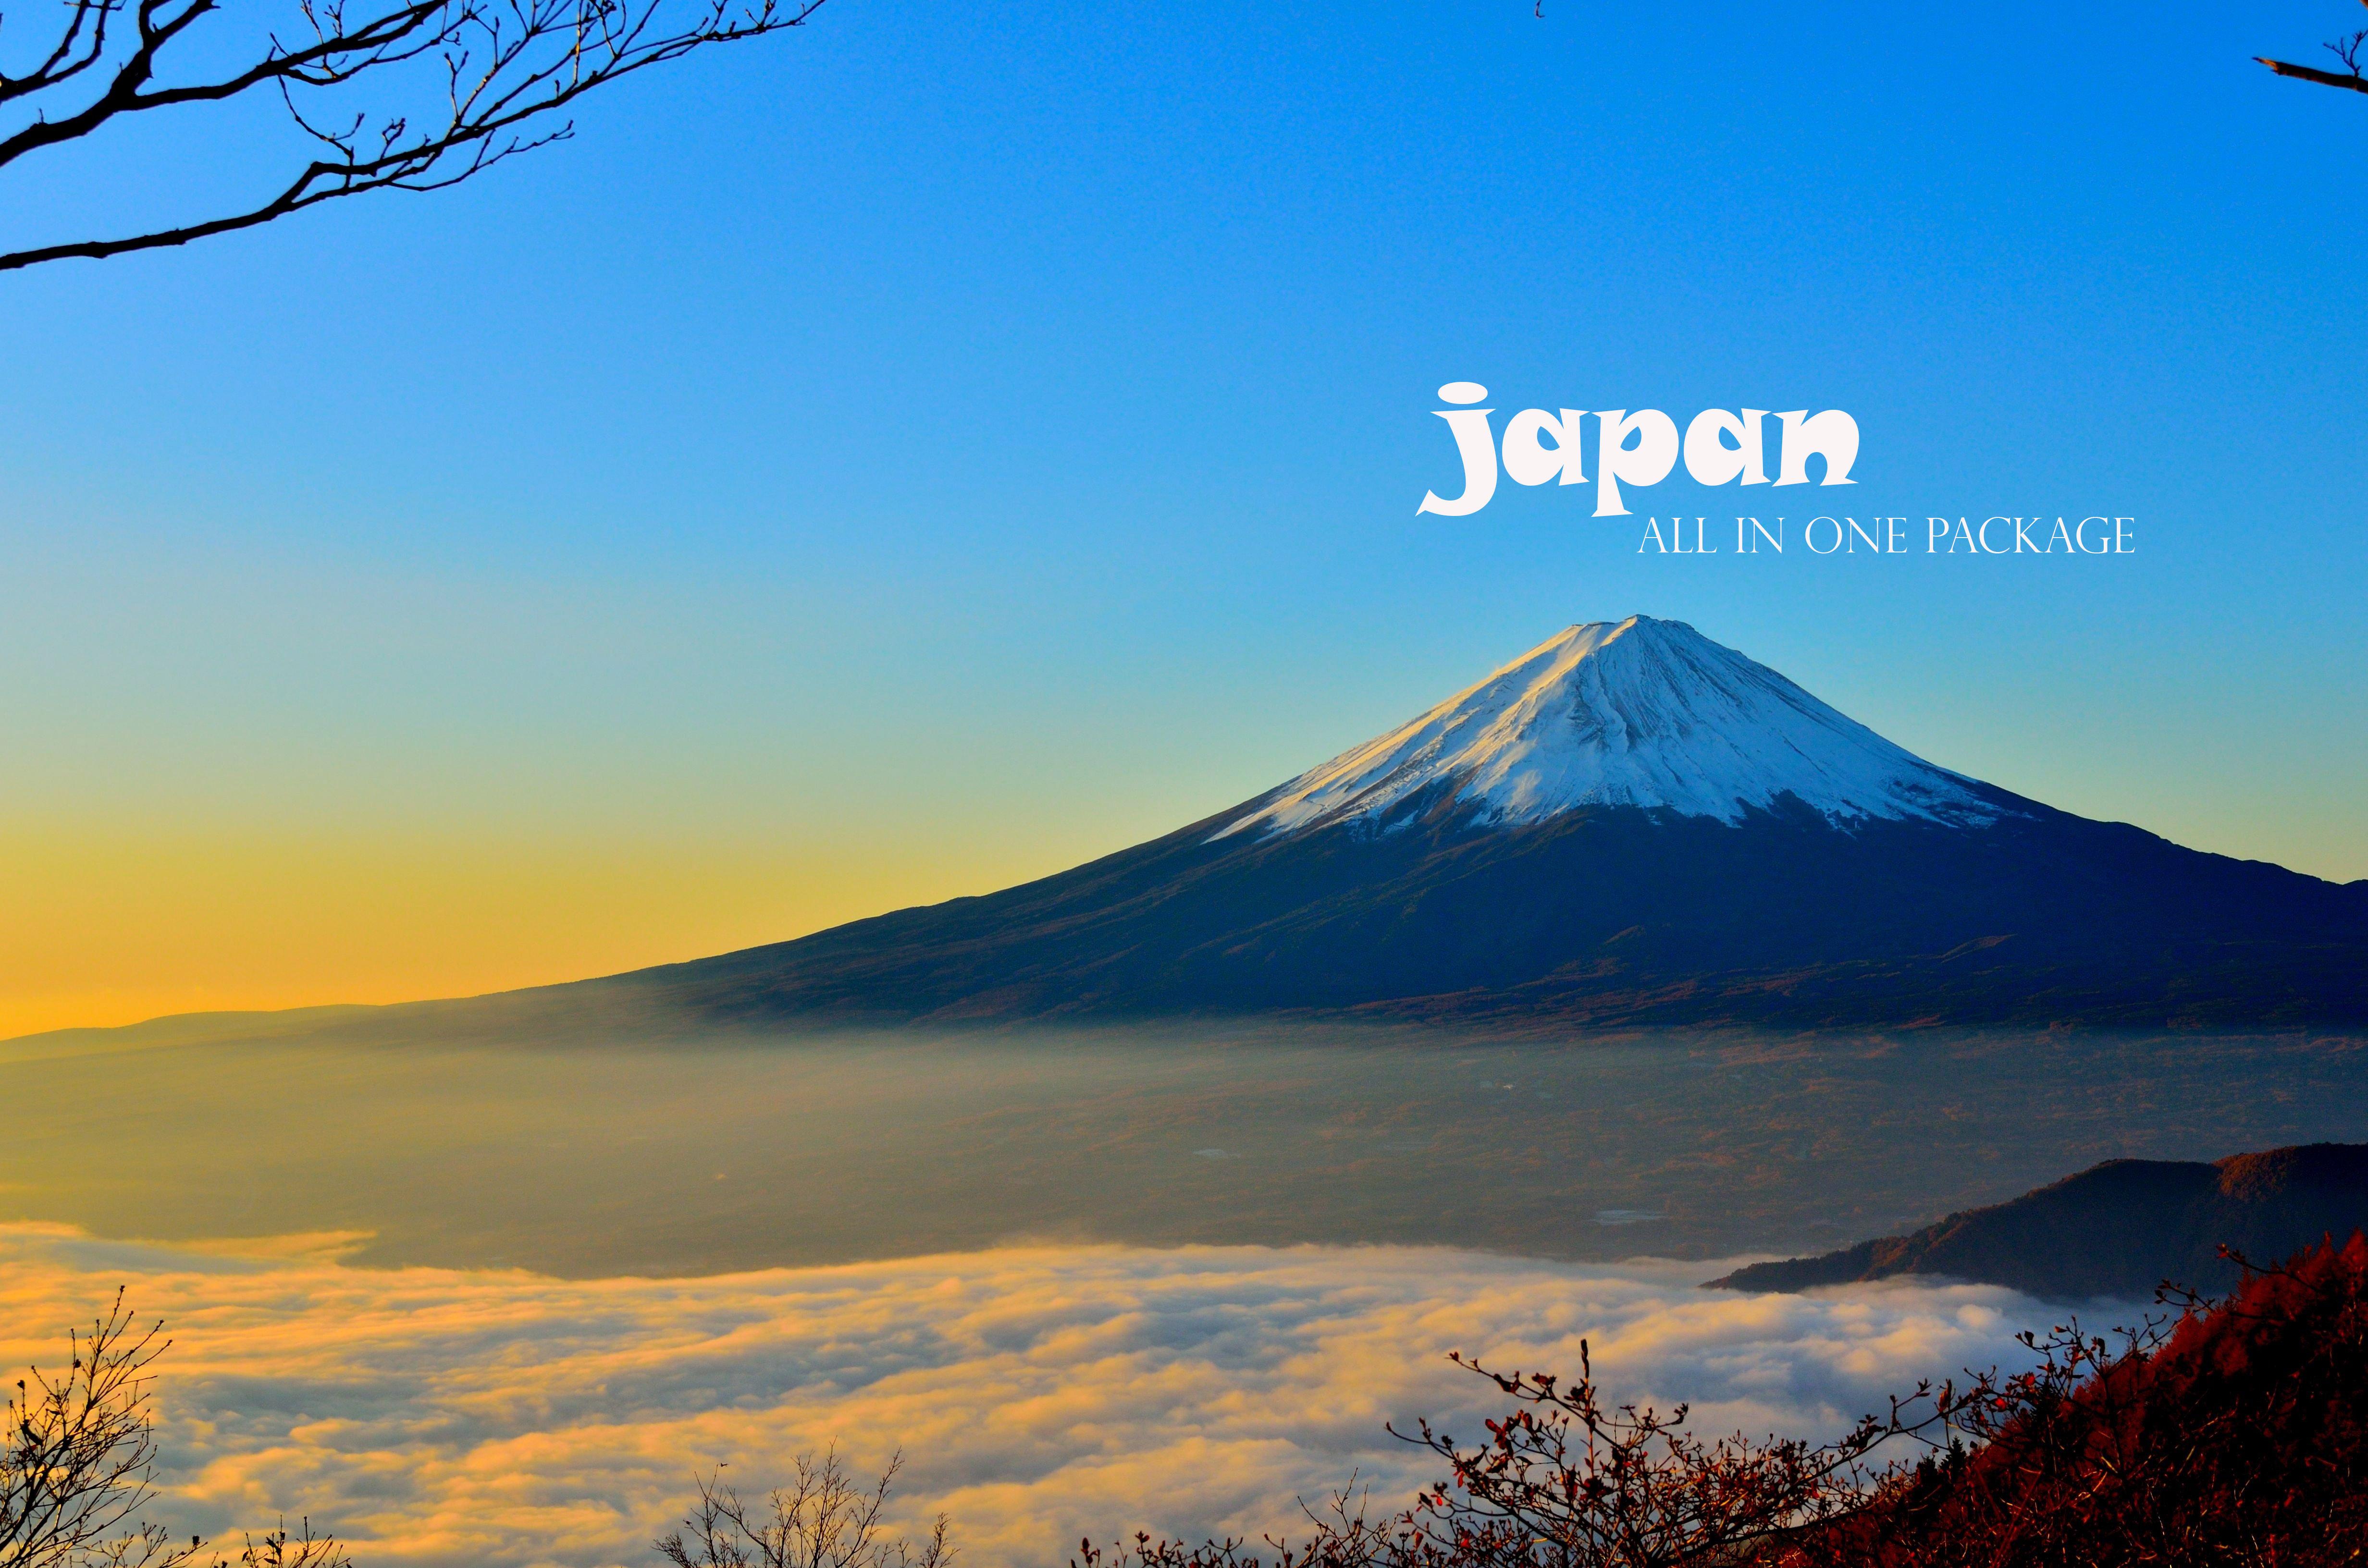 clouds-dawn-desktop-backgrounds-46253